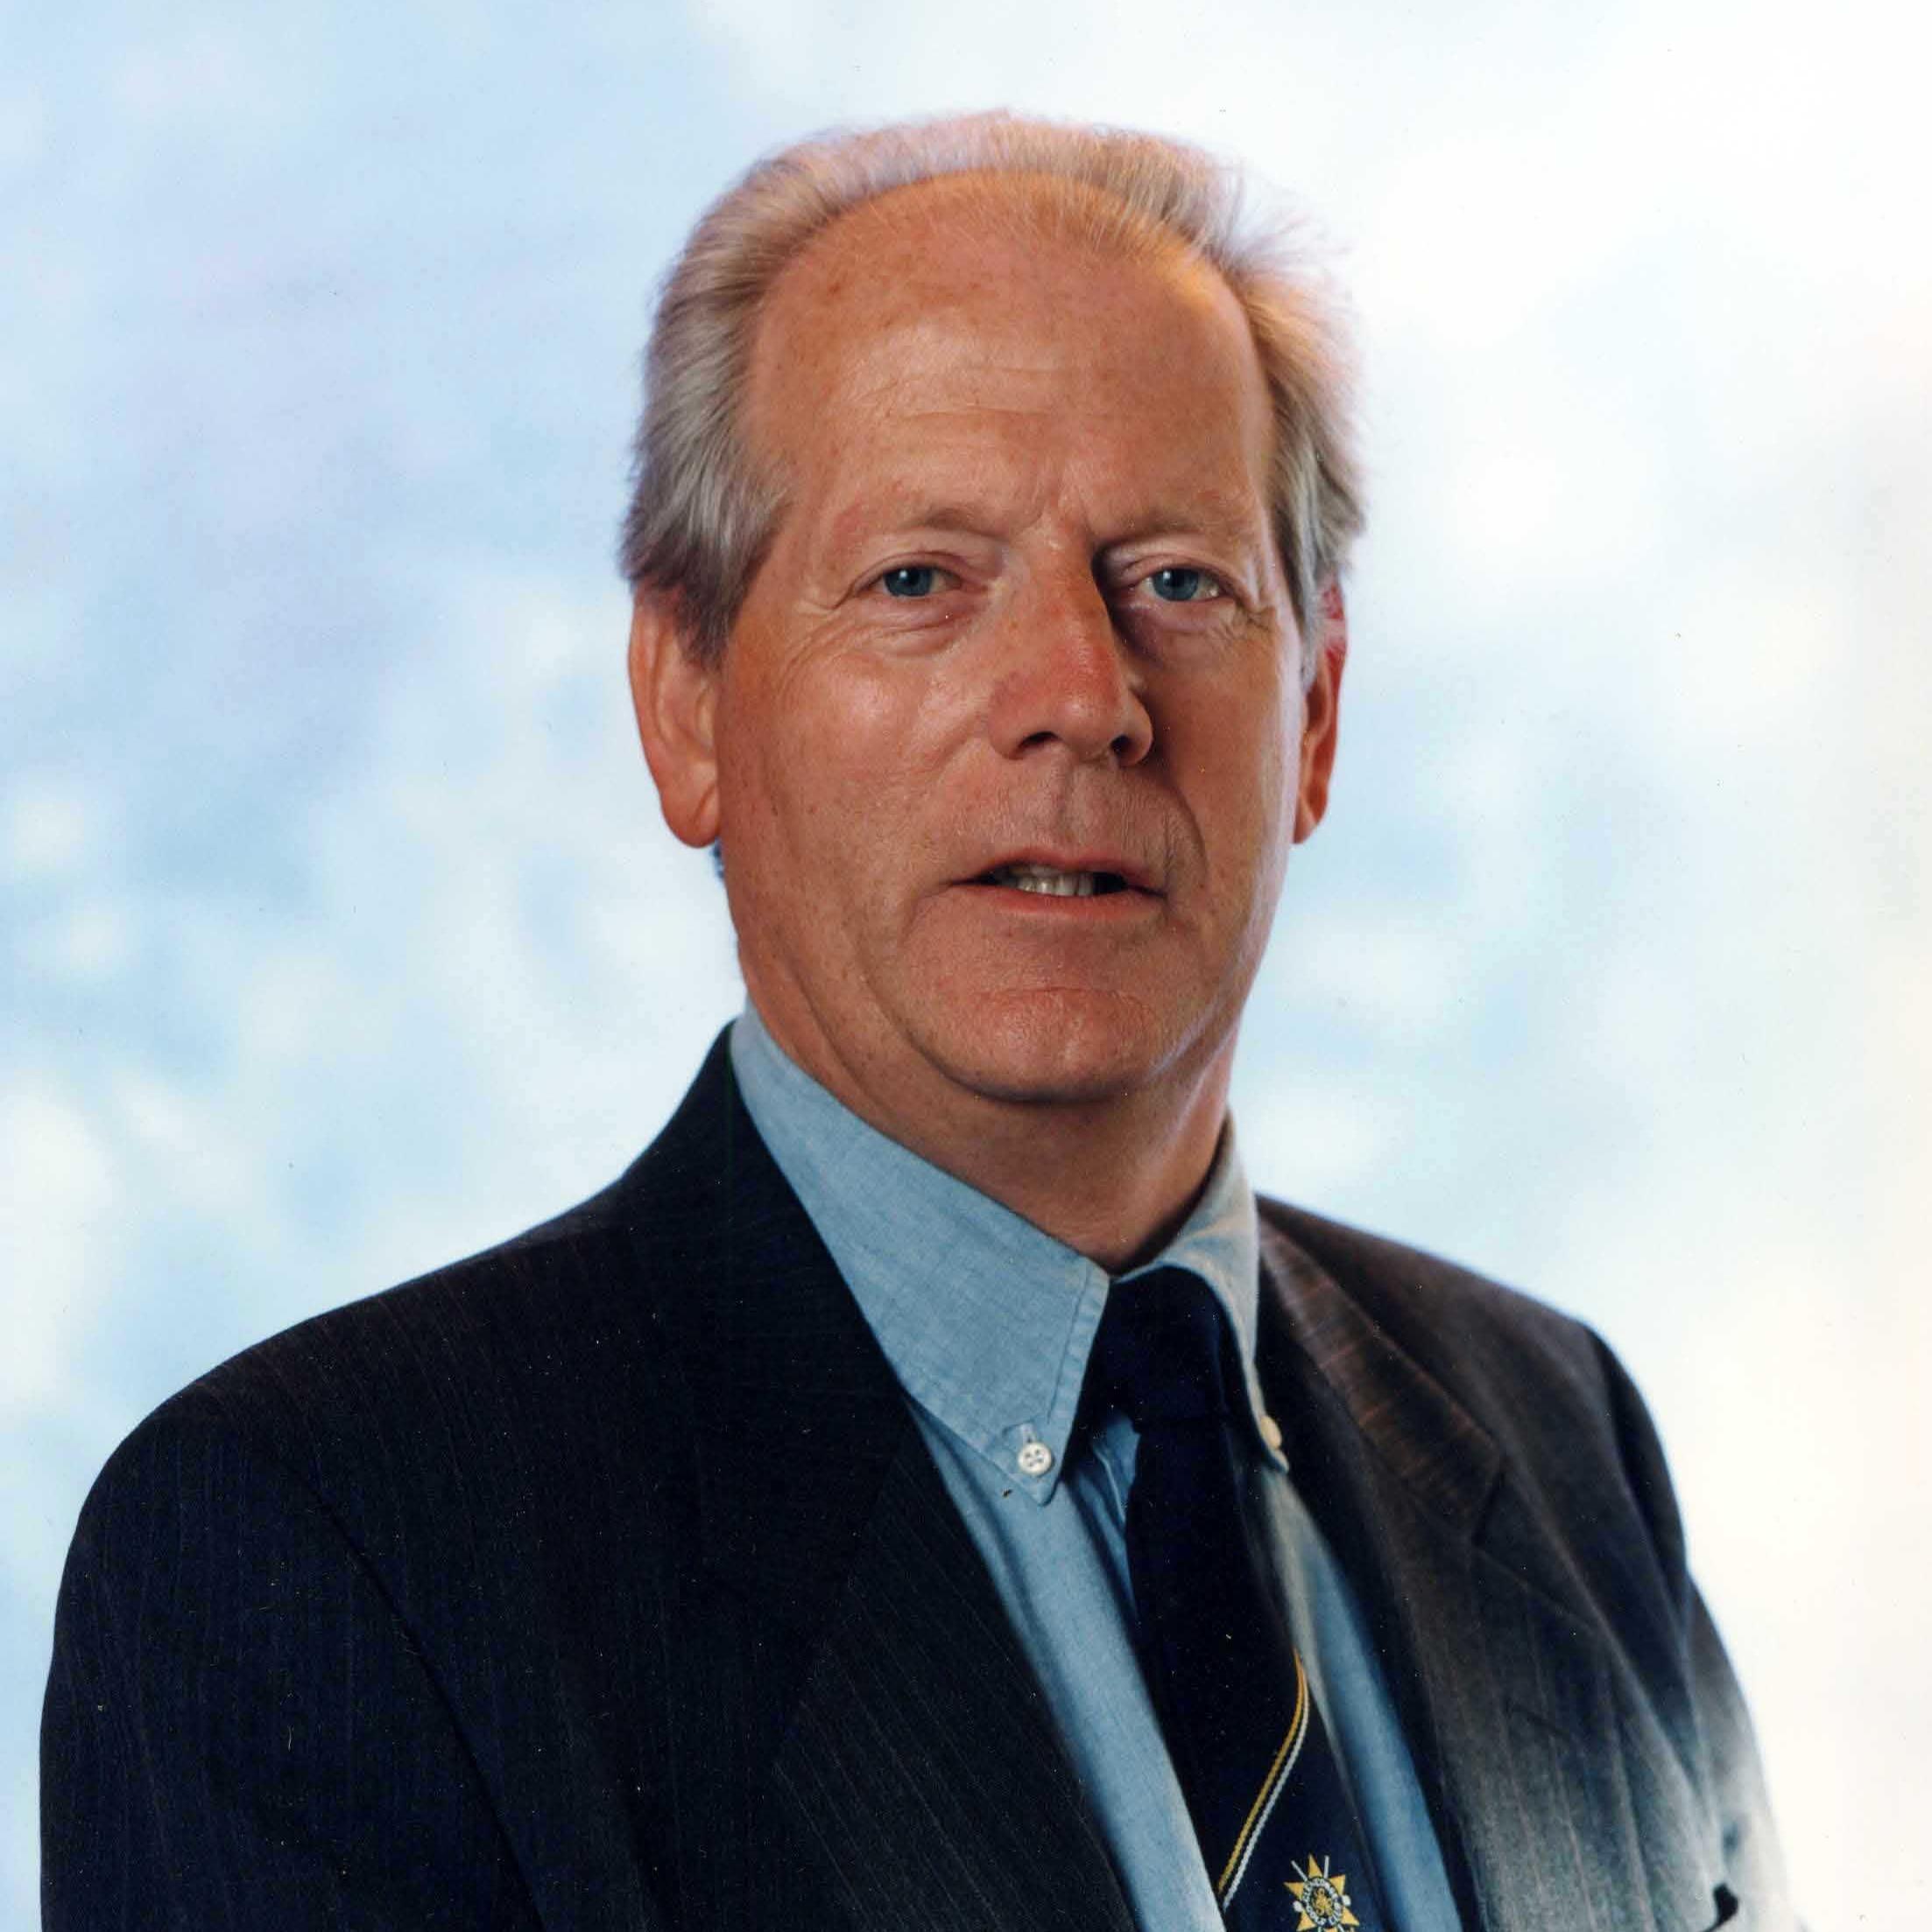 E Kynoch - 1999 - 2001